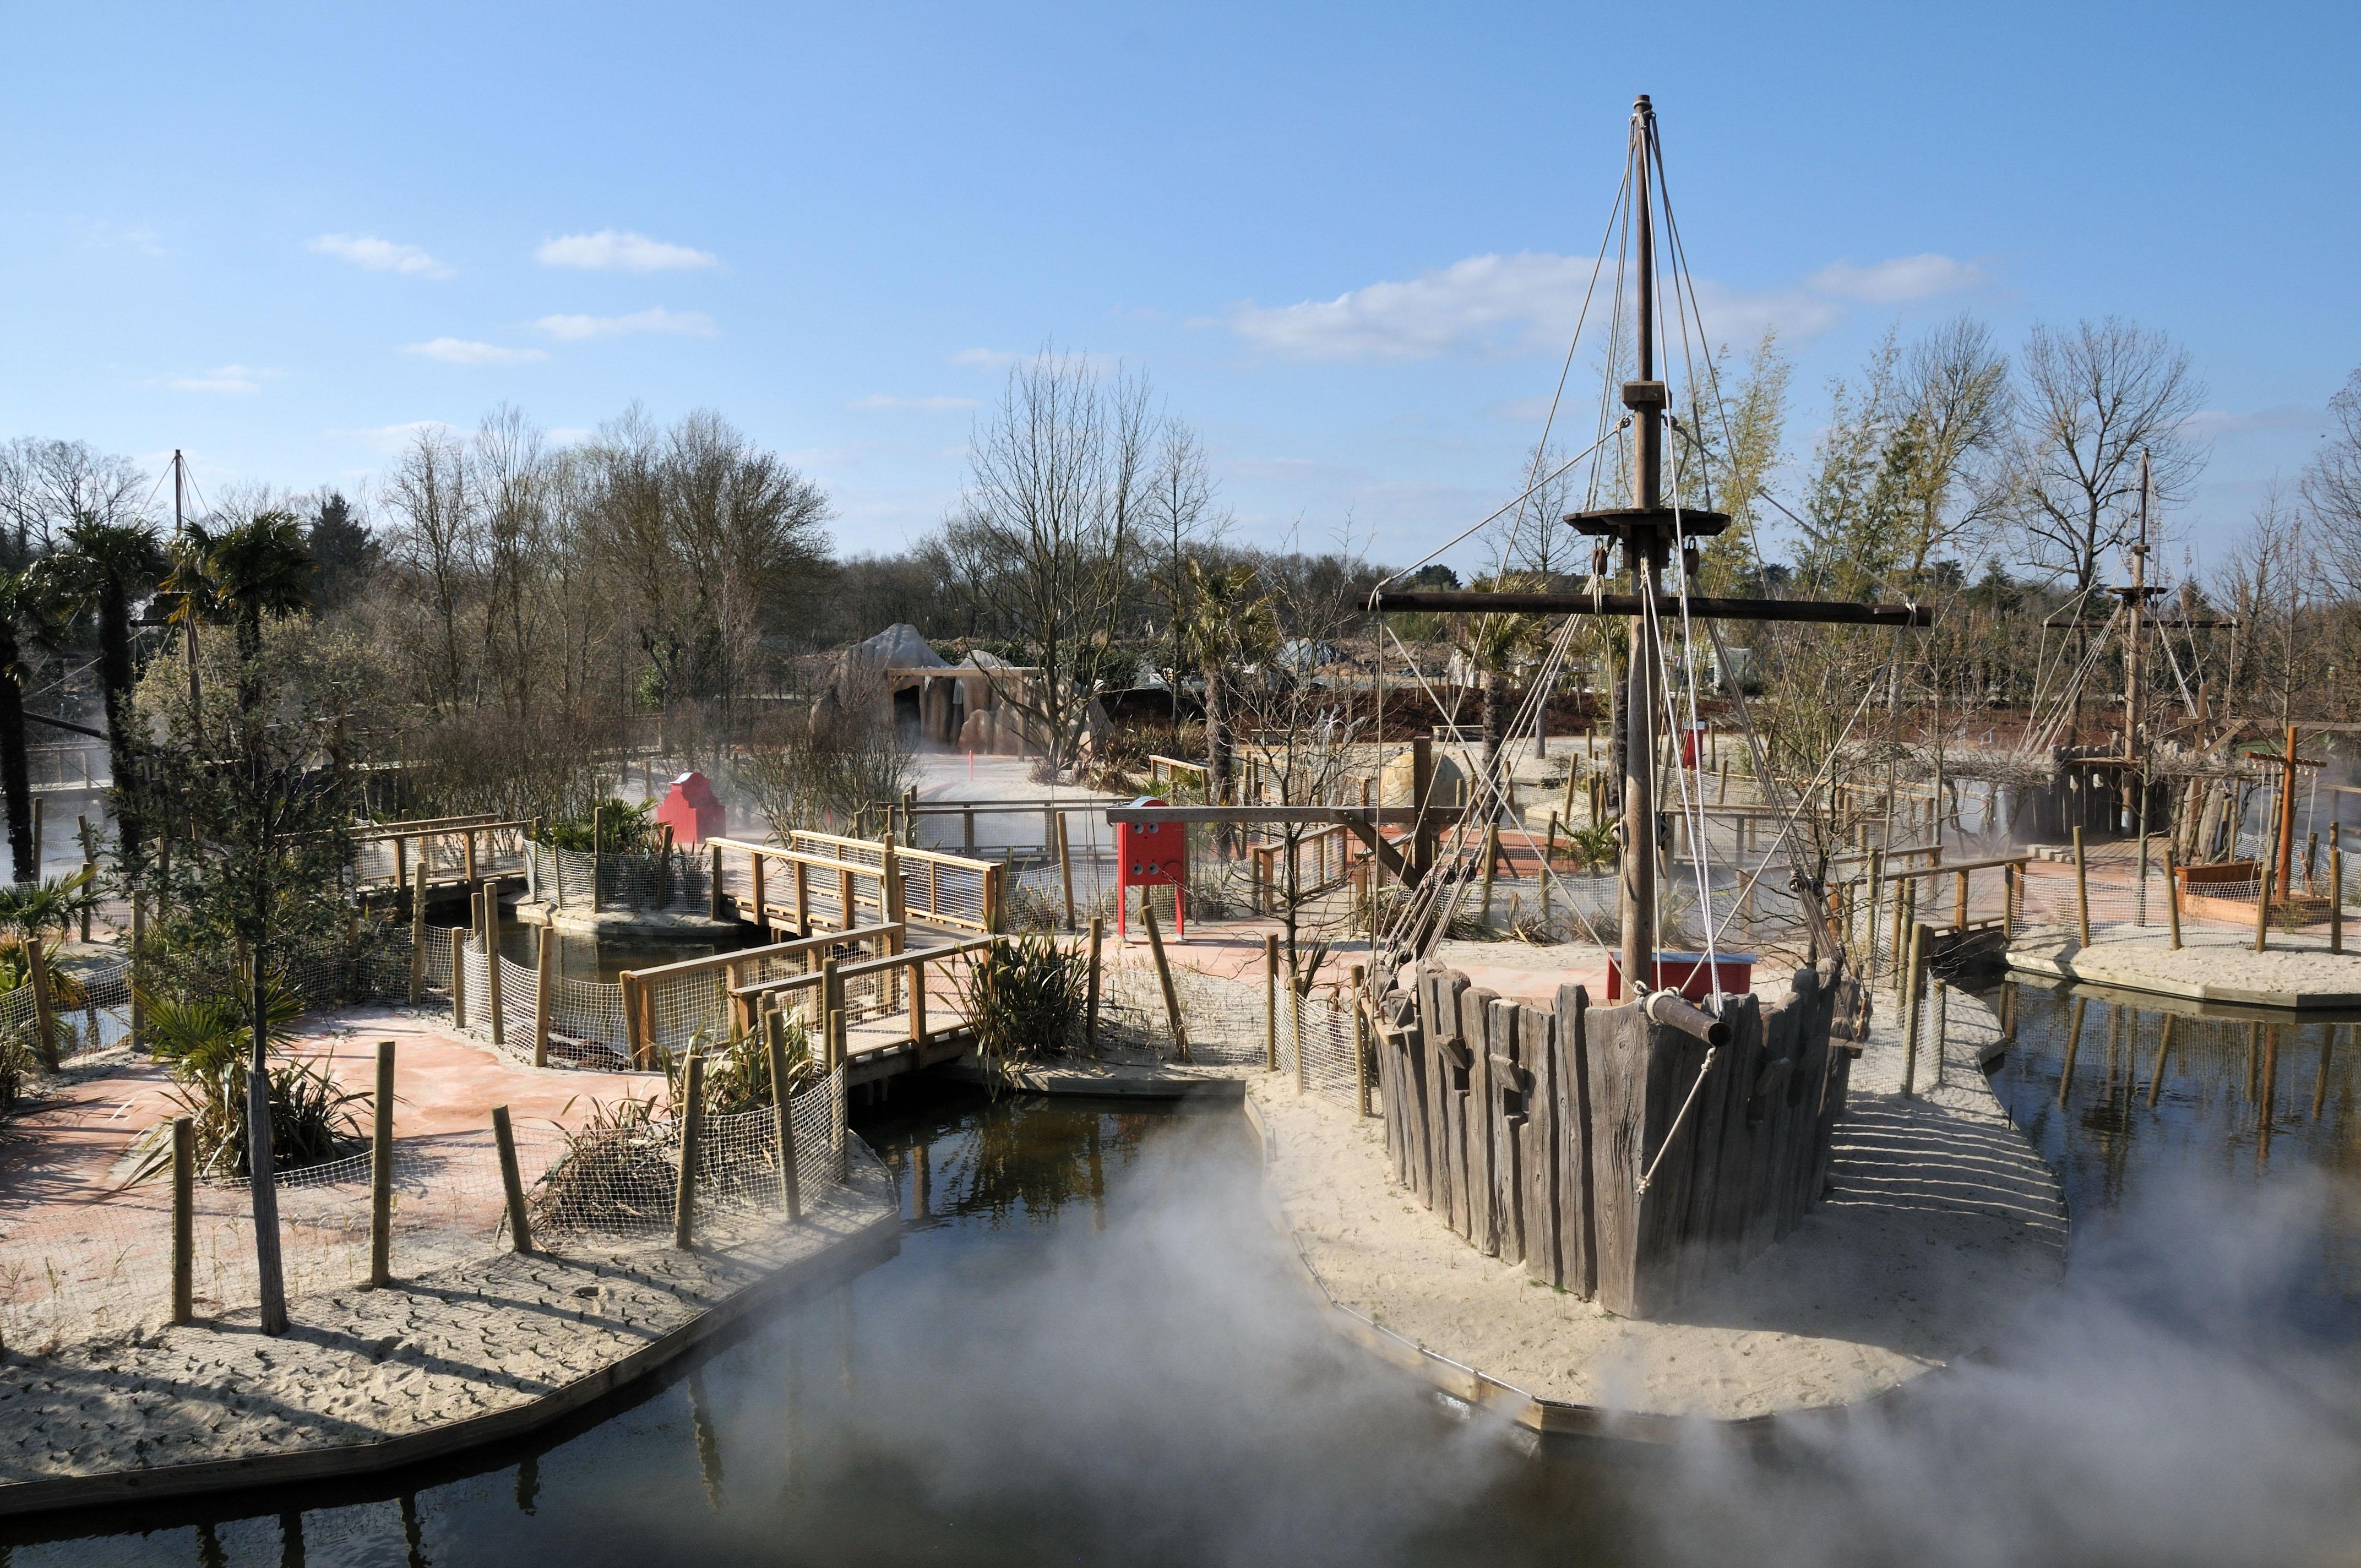 De caps et d epices 4 Terra Botanica Лучшие места отдыха для детей во Франции